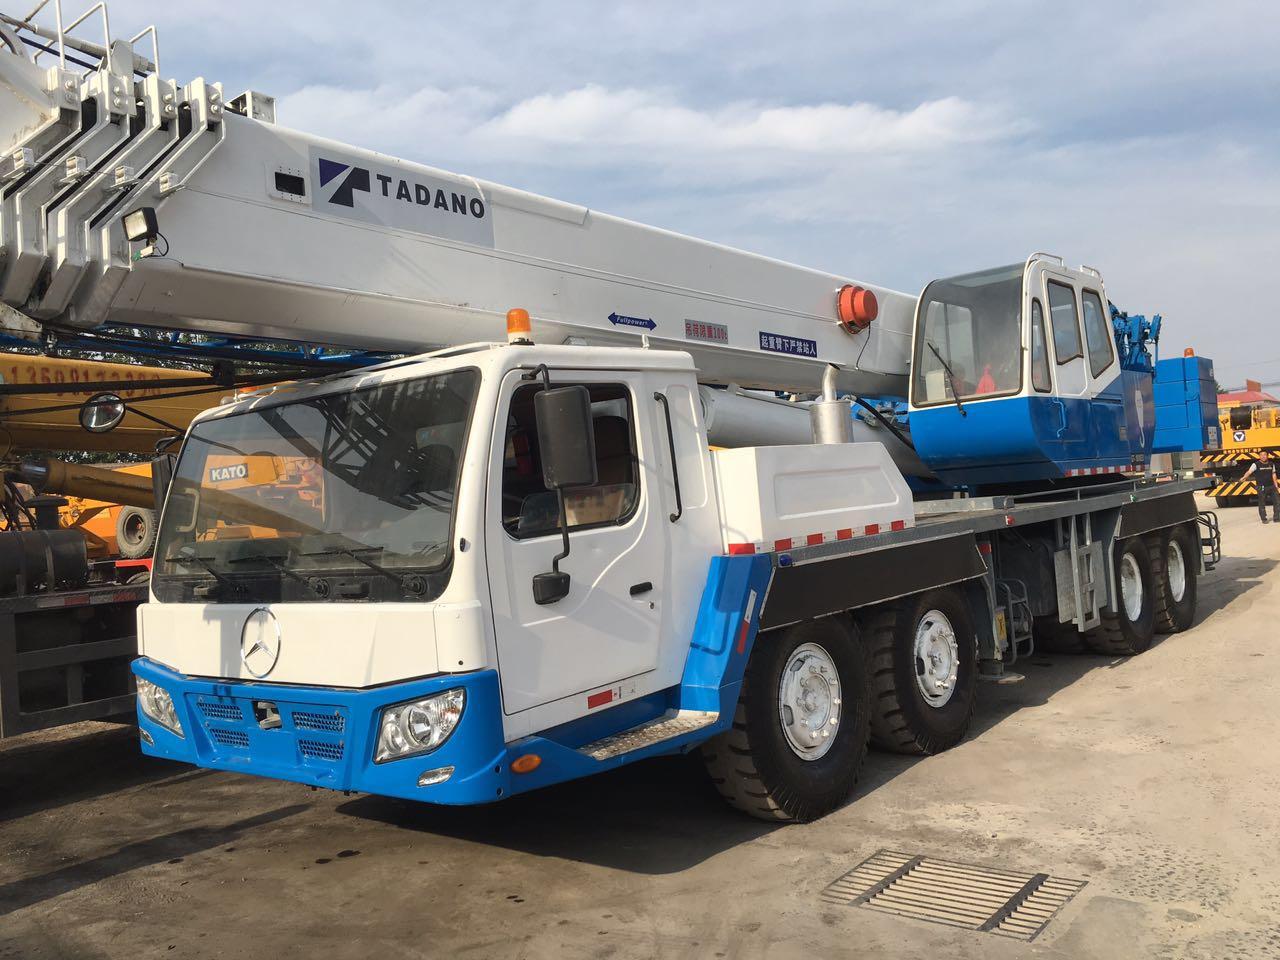 TADANO GT-1000EX Truck Crane 100 Ton, 100 Ton Japan Original TADANO Truck  Crane